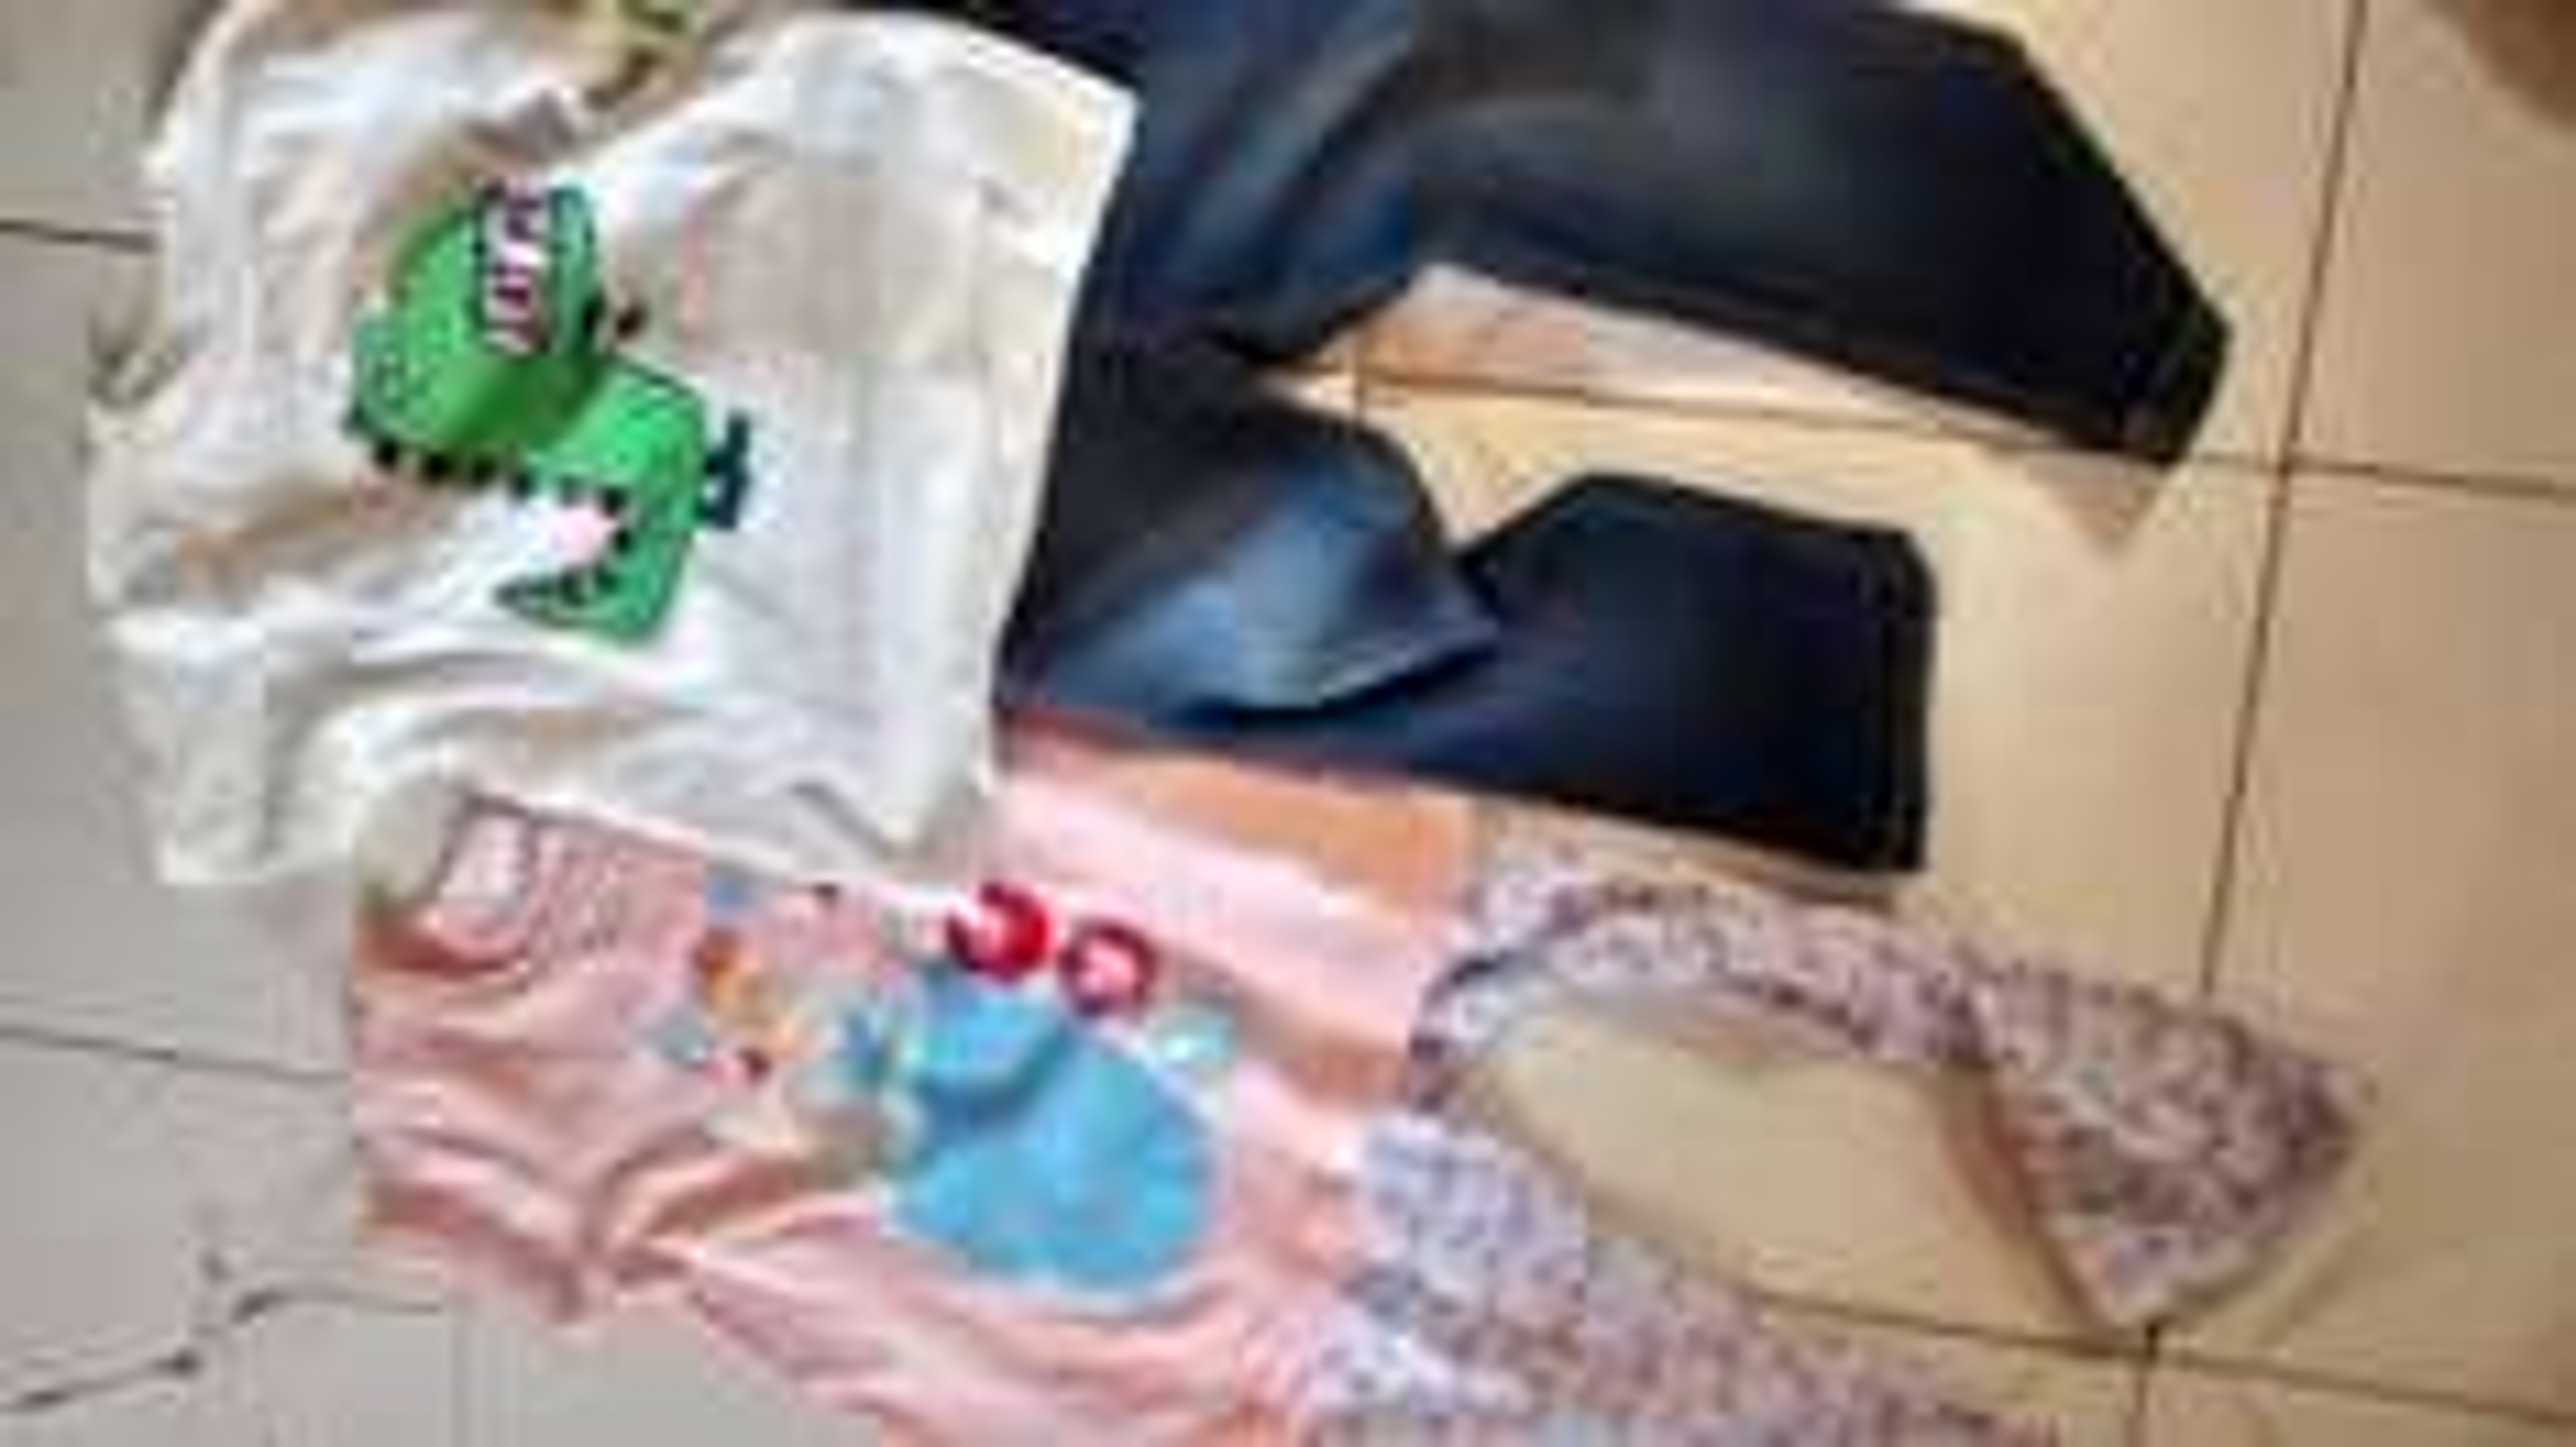 Bodega Aurrerá: Melchor Ocampo varias liquidaciones, ejemplo: Pijama para niña a $30.02